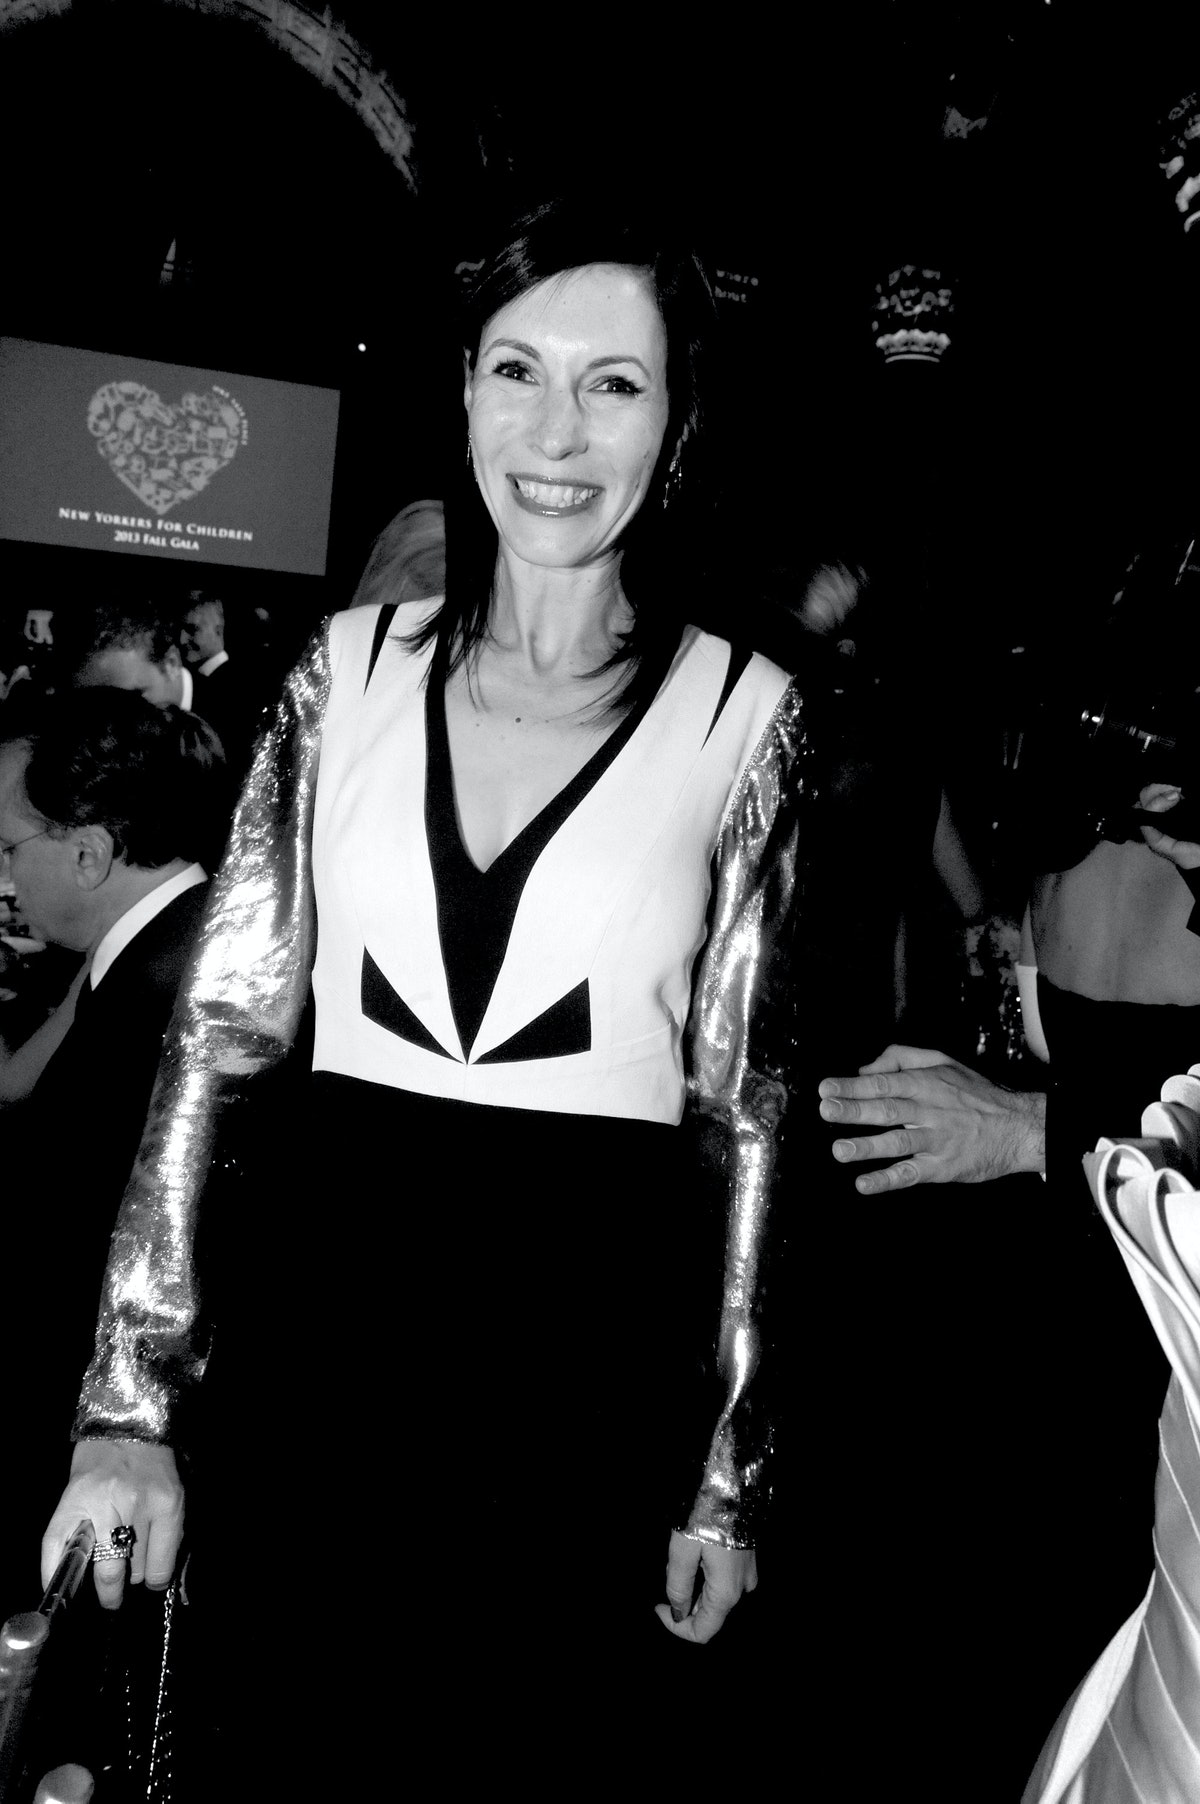 NYFC-Fall-2013-Jill-Kargman